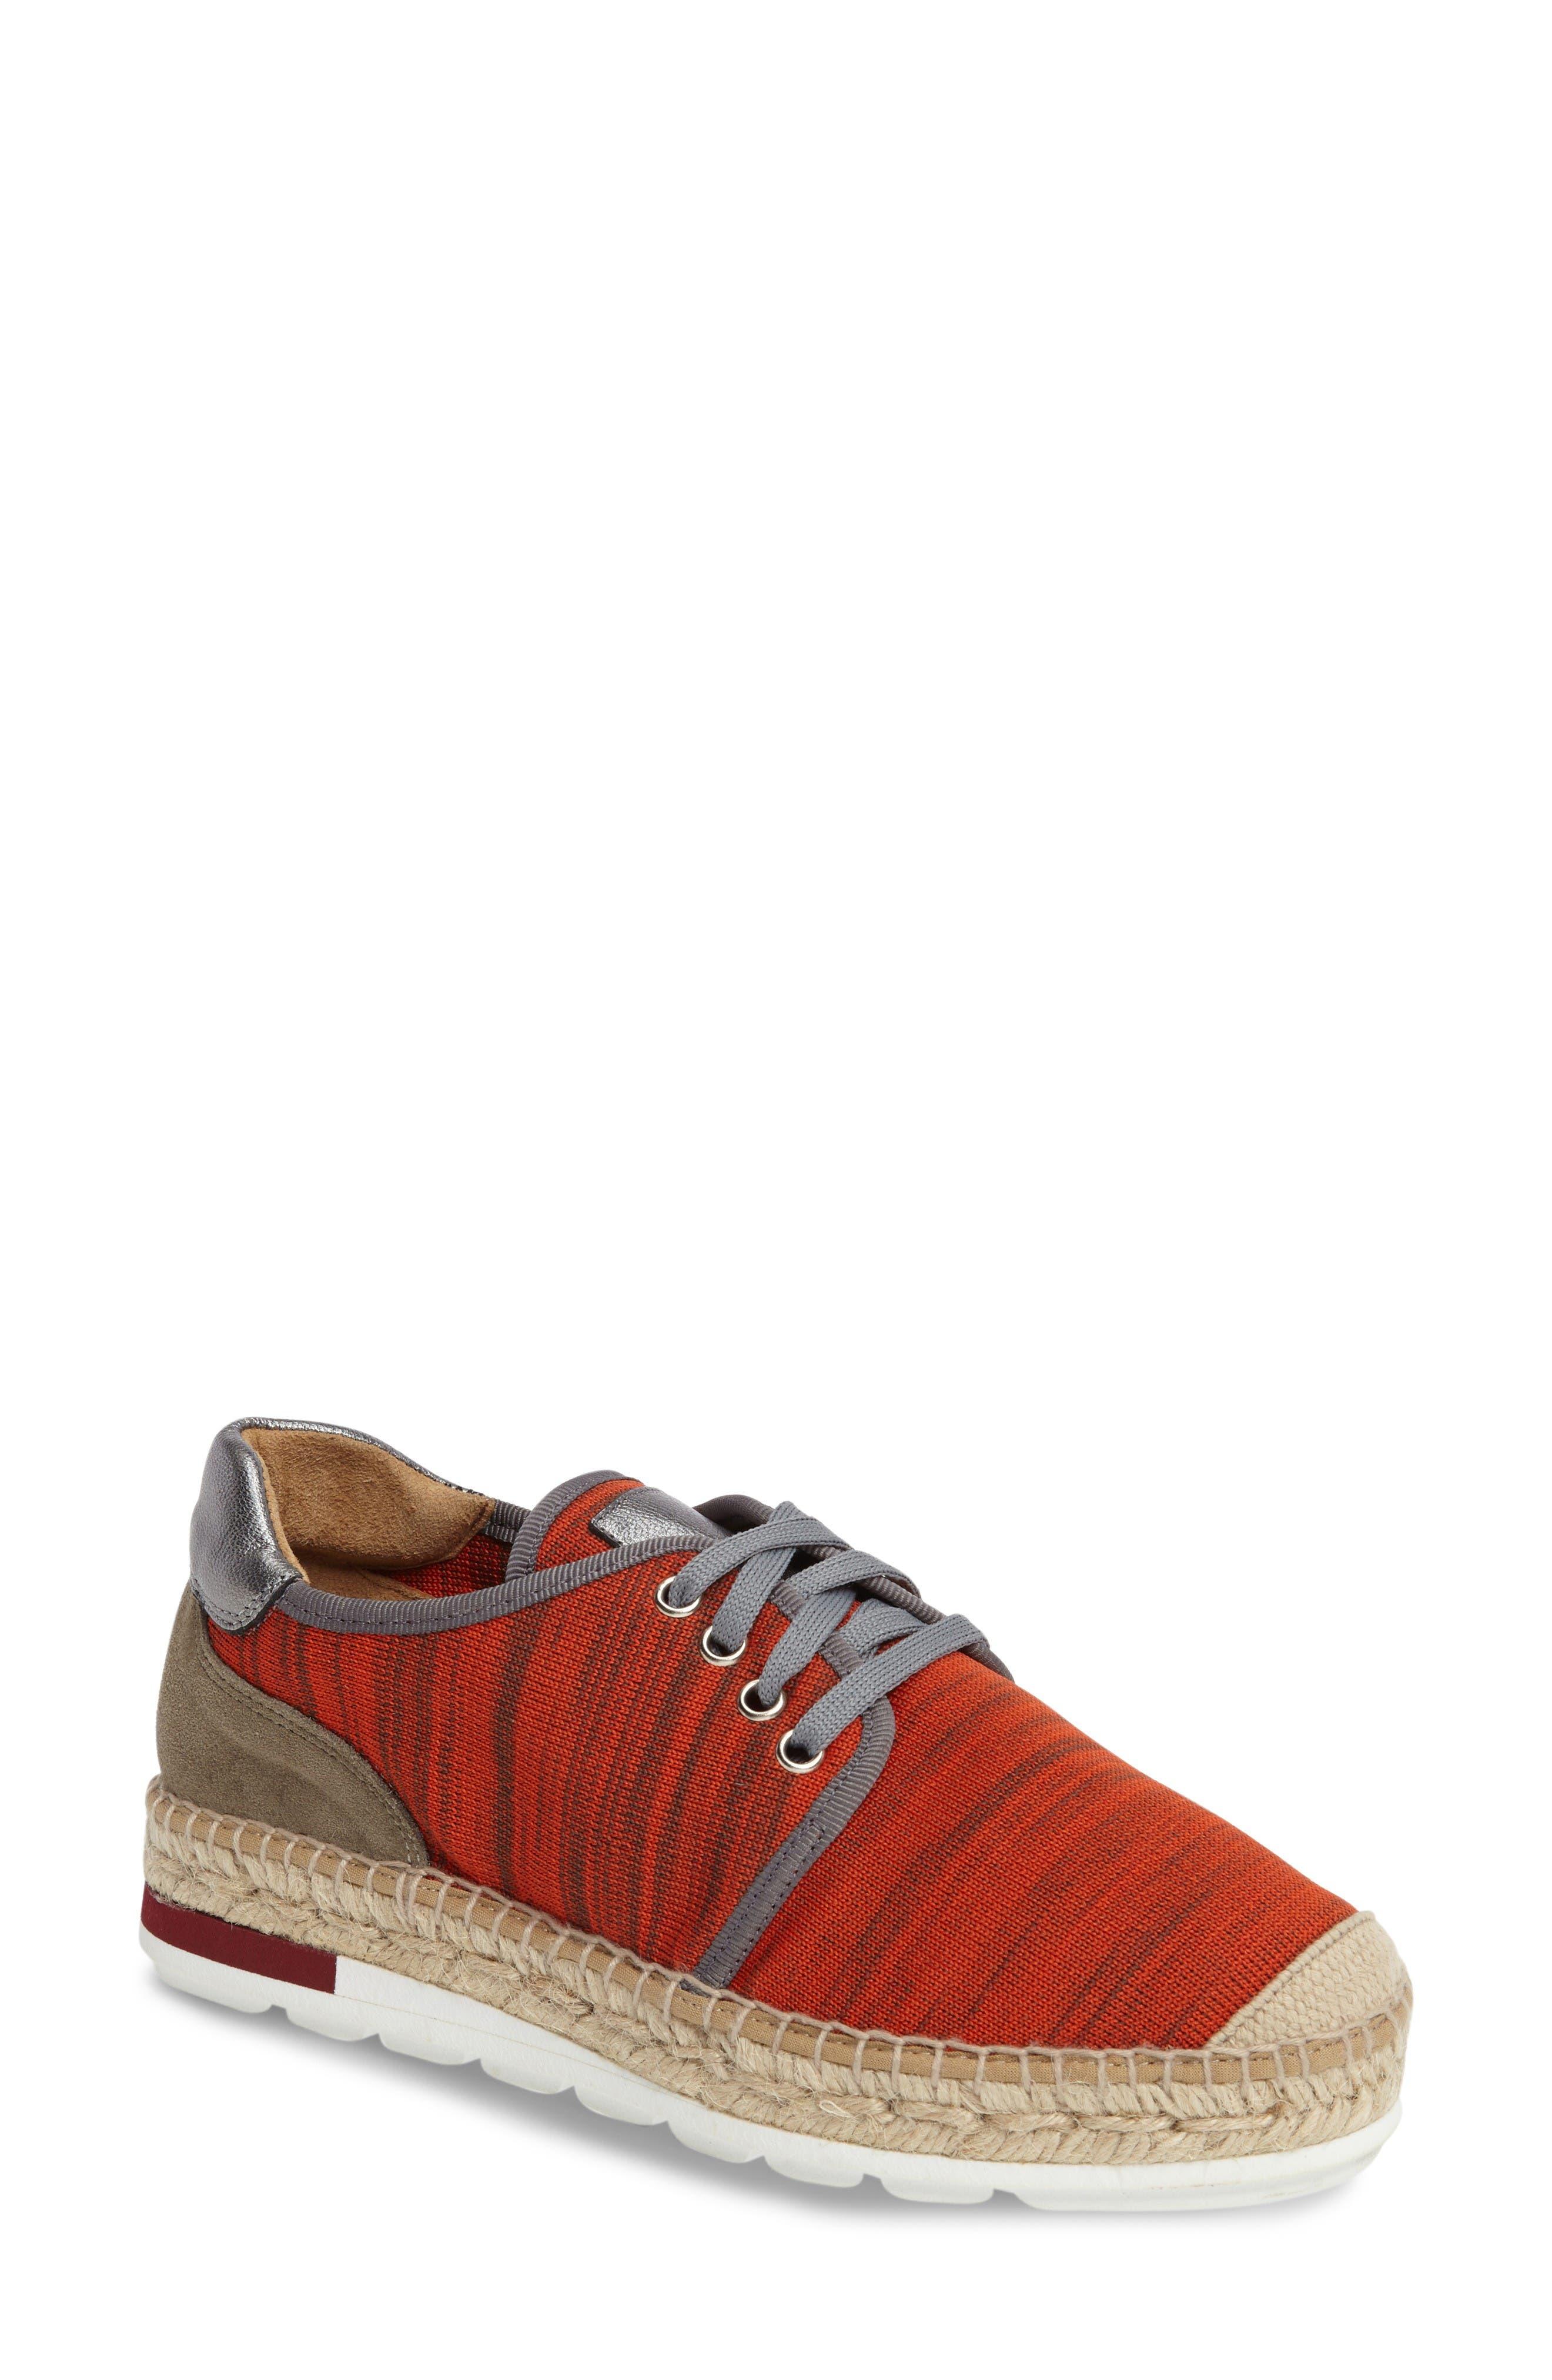 Alternate Image 1 Selected - Bettye Muller Newport Mesh Espadrille Sneaker (Women)